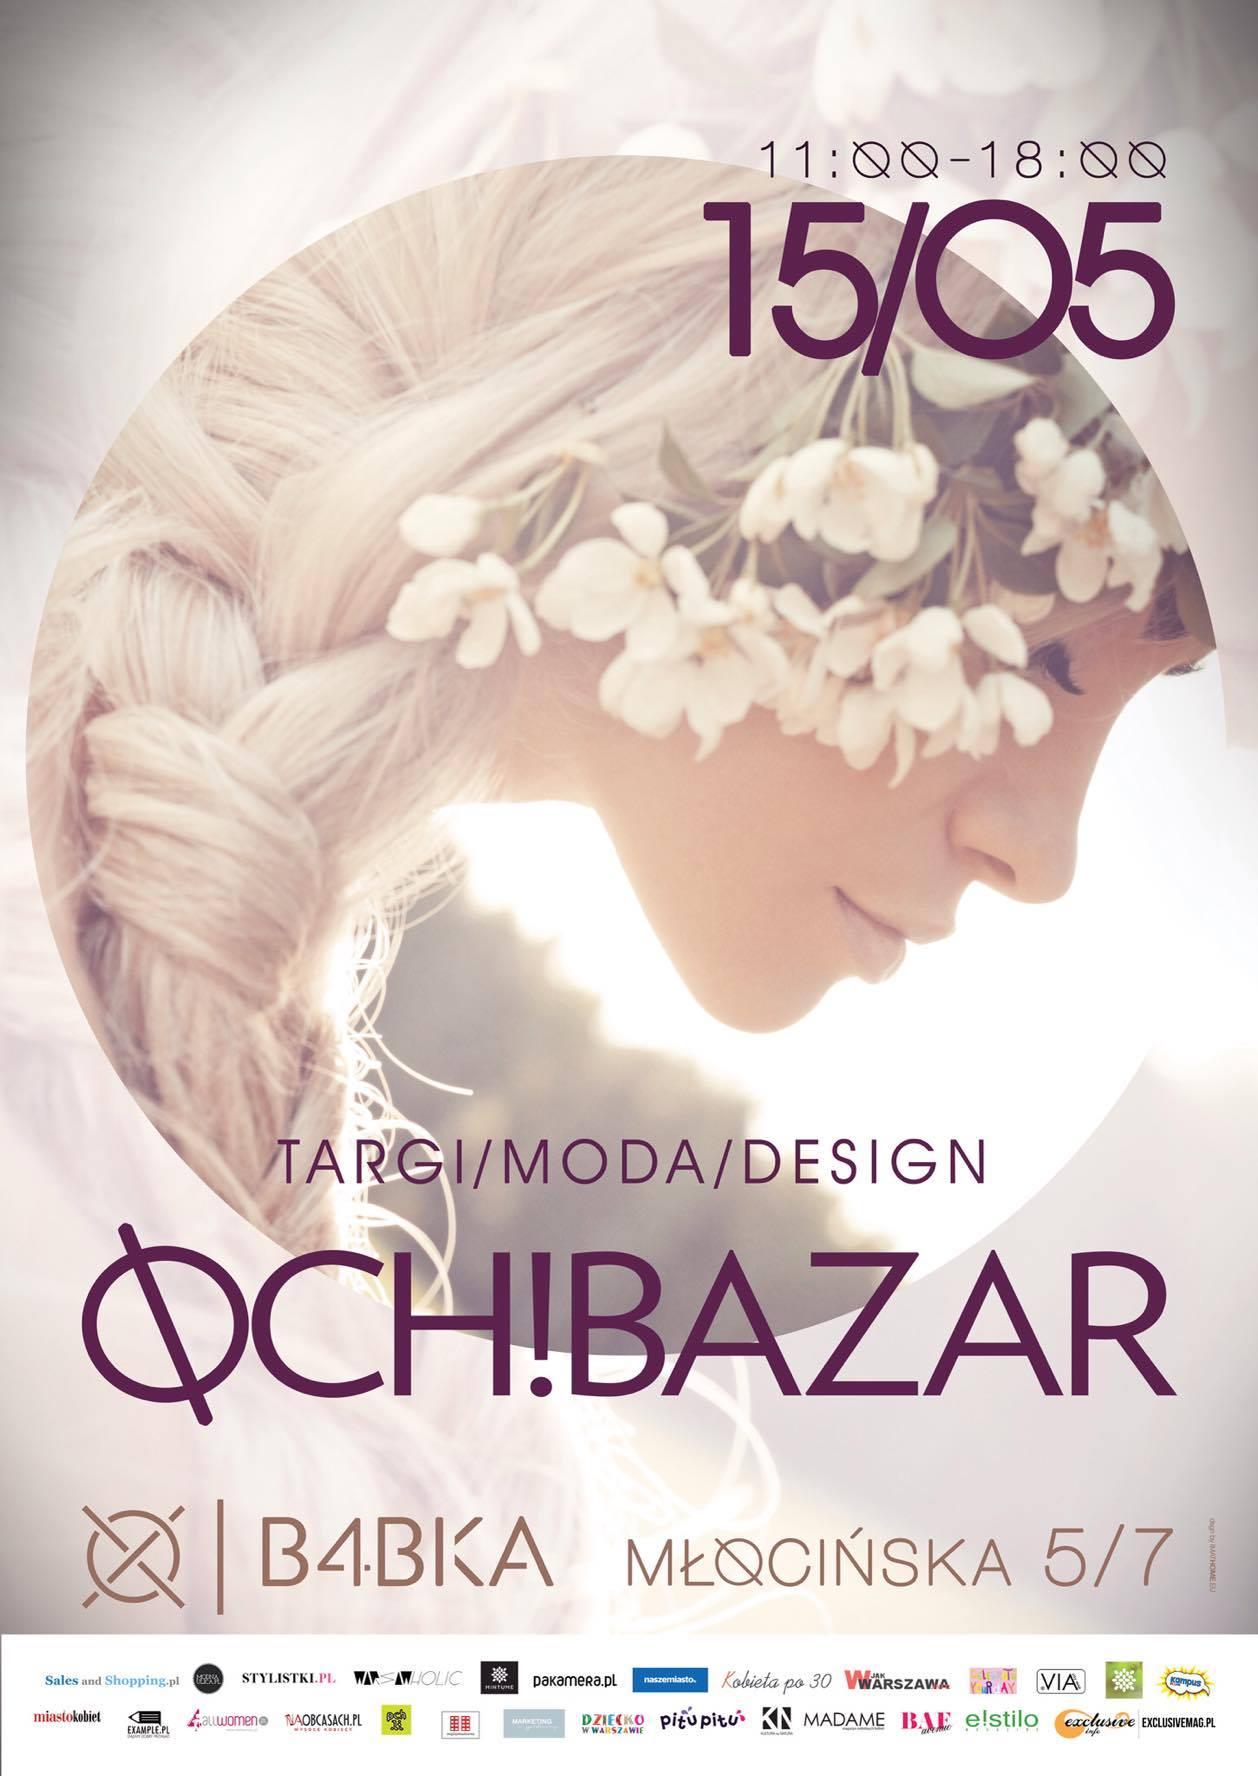 Targi mody i designu Och! Bazar Warszawa 15 maja 2016